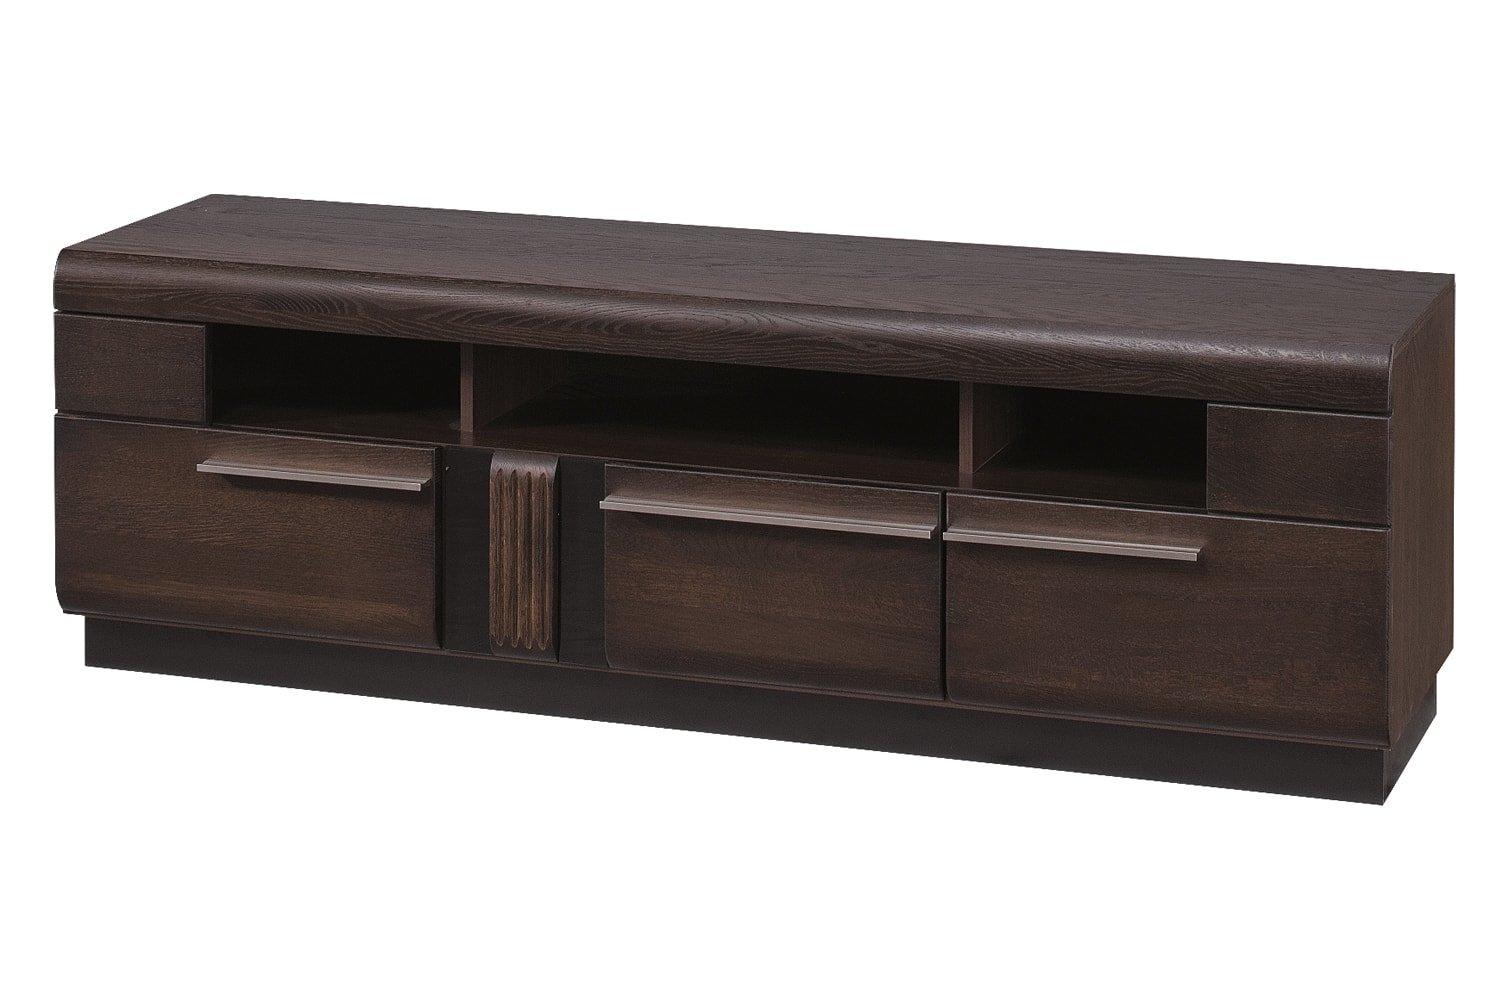 Comoda TV Porti 25 Chocolate Oak l160xA42xH51 cm